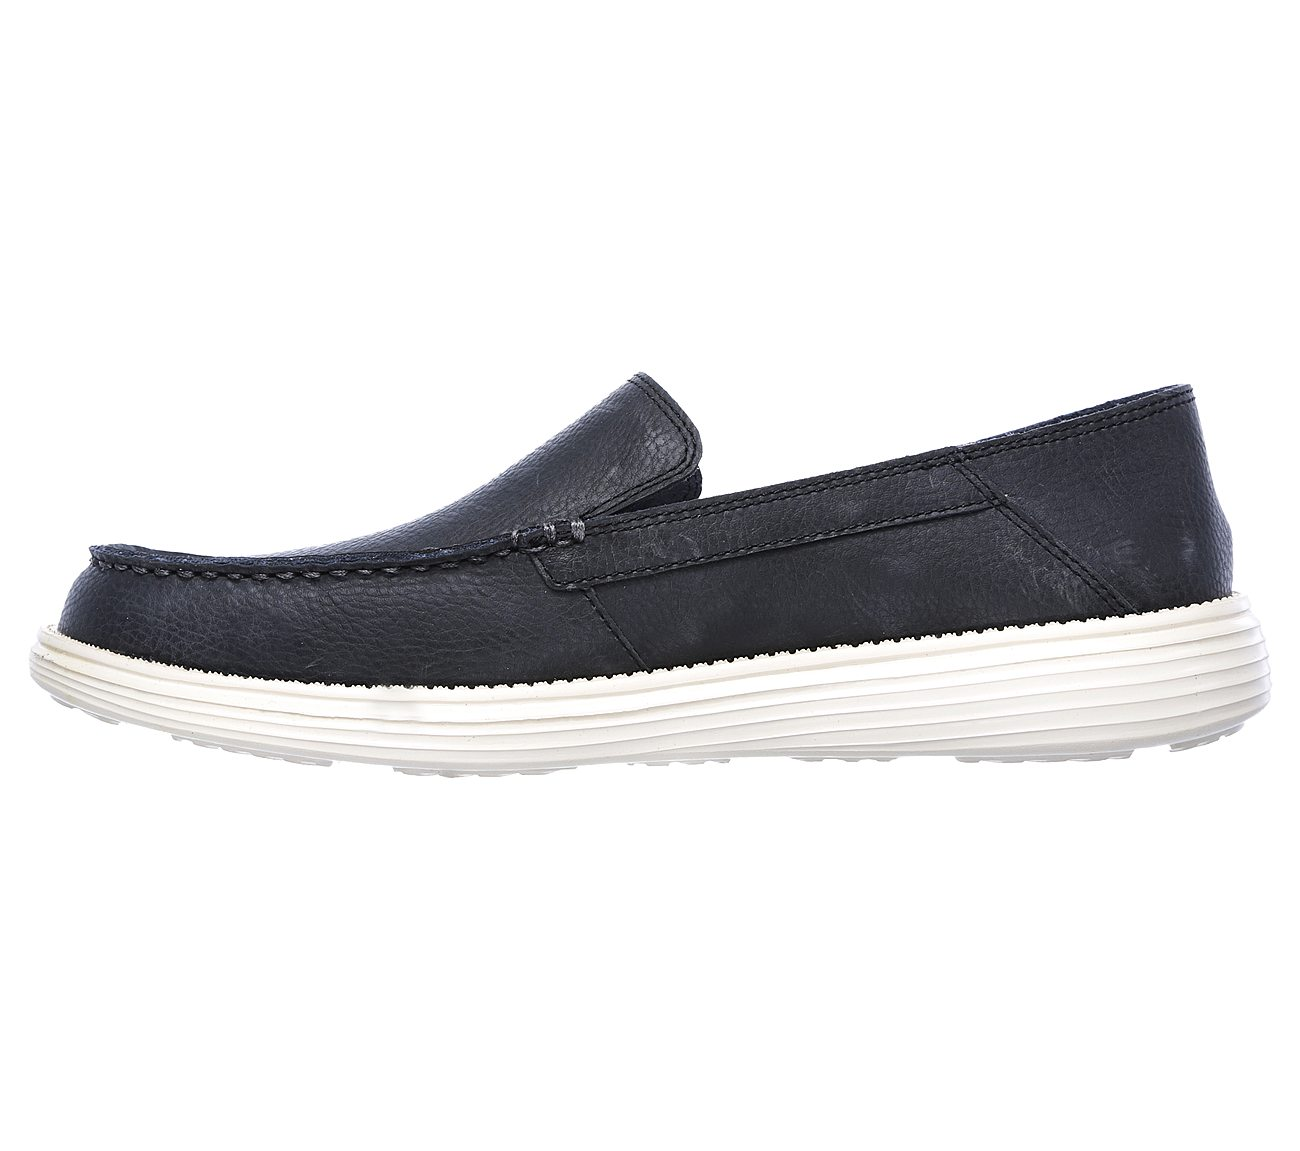 Skechers Mens Status Breson Slip On Leather Cushioned Loafer Shoes 0HL5Z5Mf59